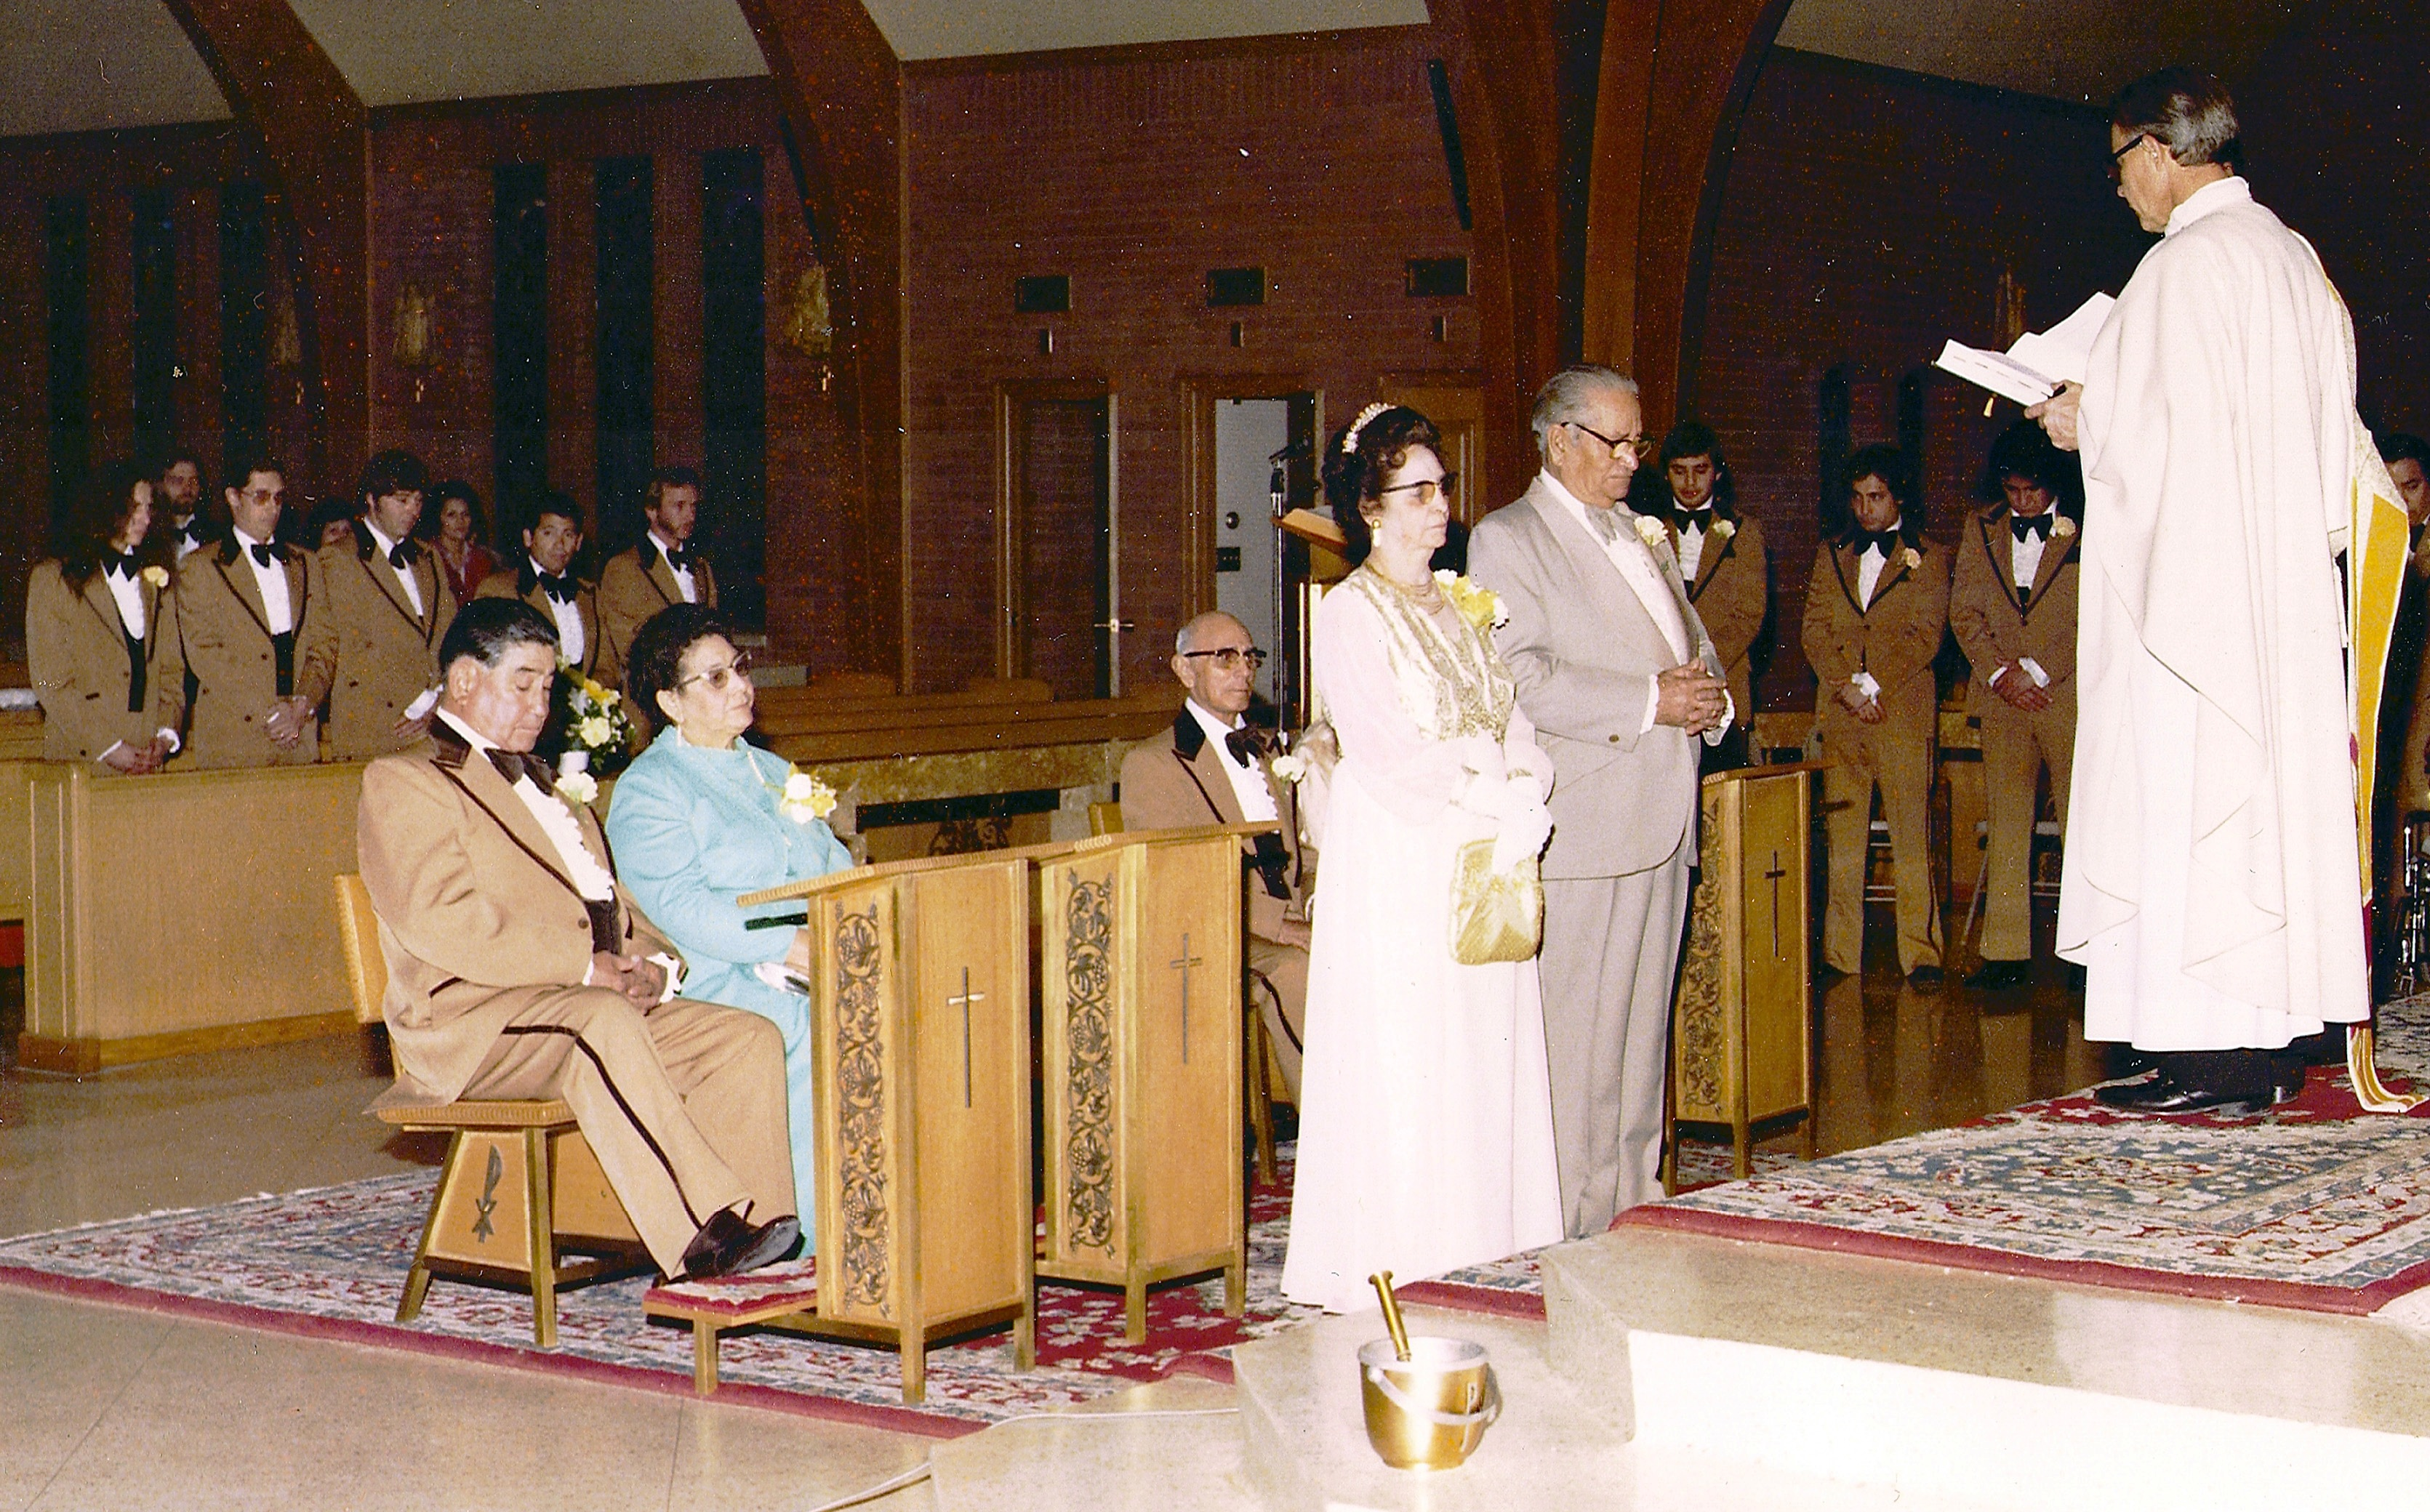 Delia And Edward Tafoya Renewal Of Vows At 50th Wedding Anniversary Color Photo